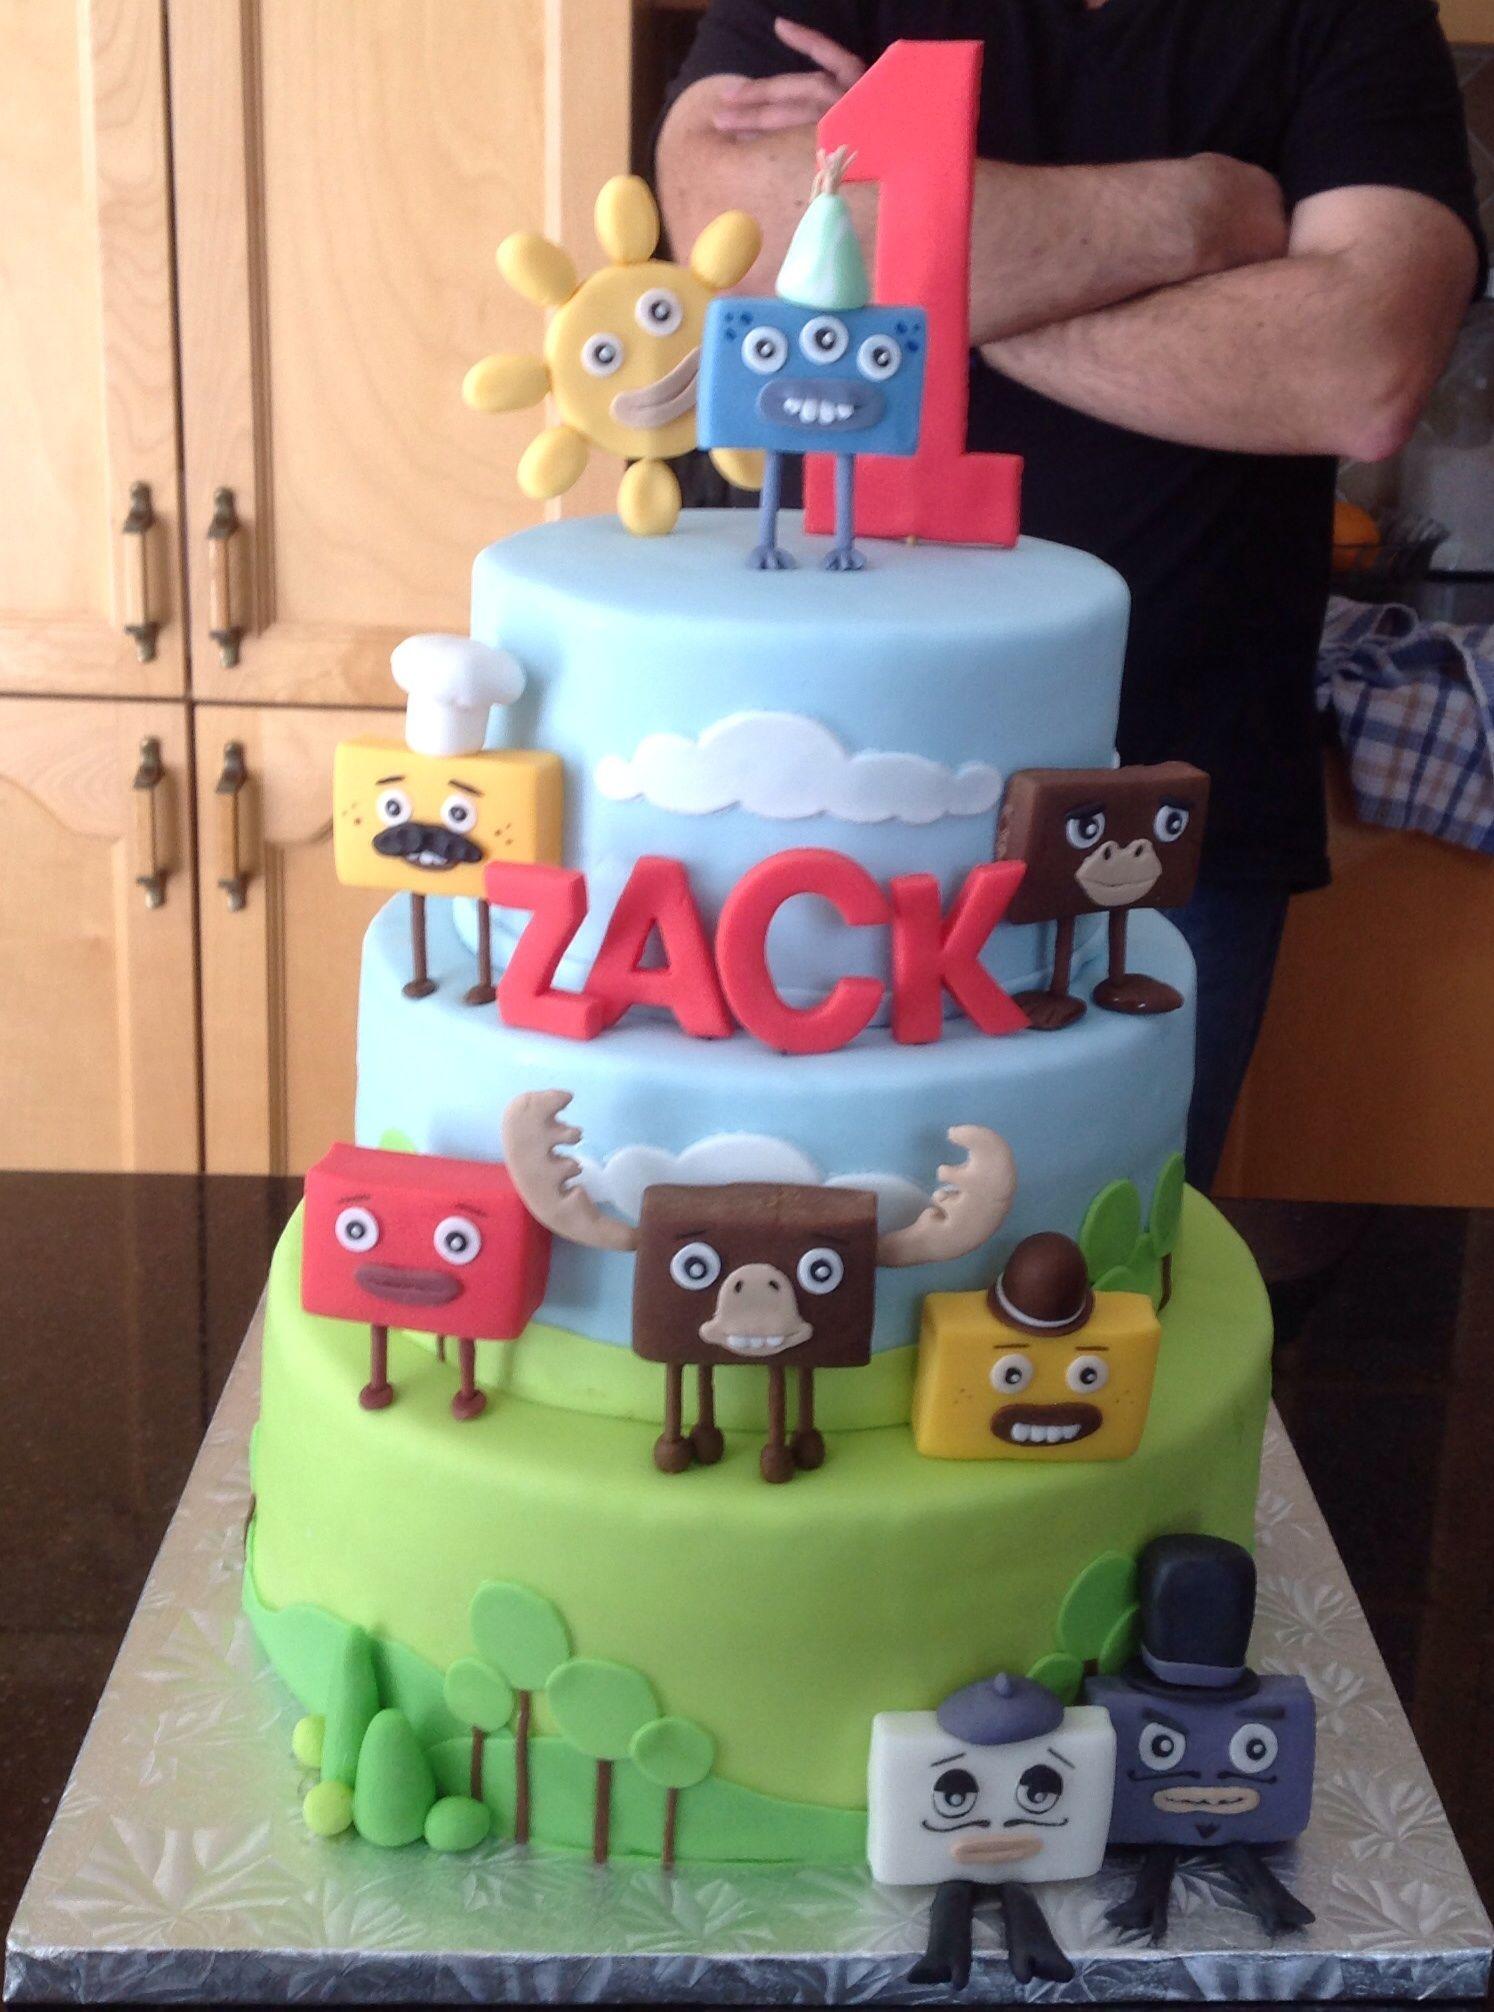 Best Big Block Sing Song Birthday Cake Ive Seen So Far Bday